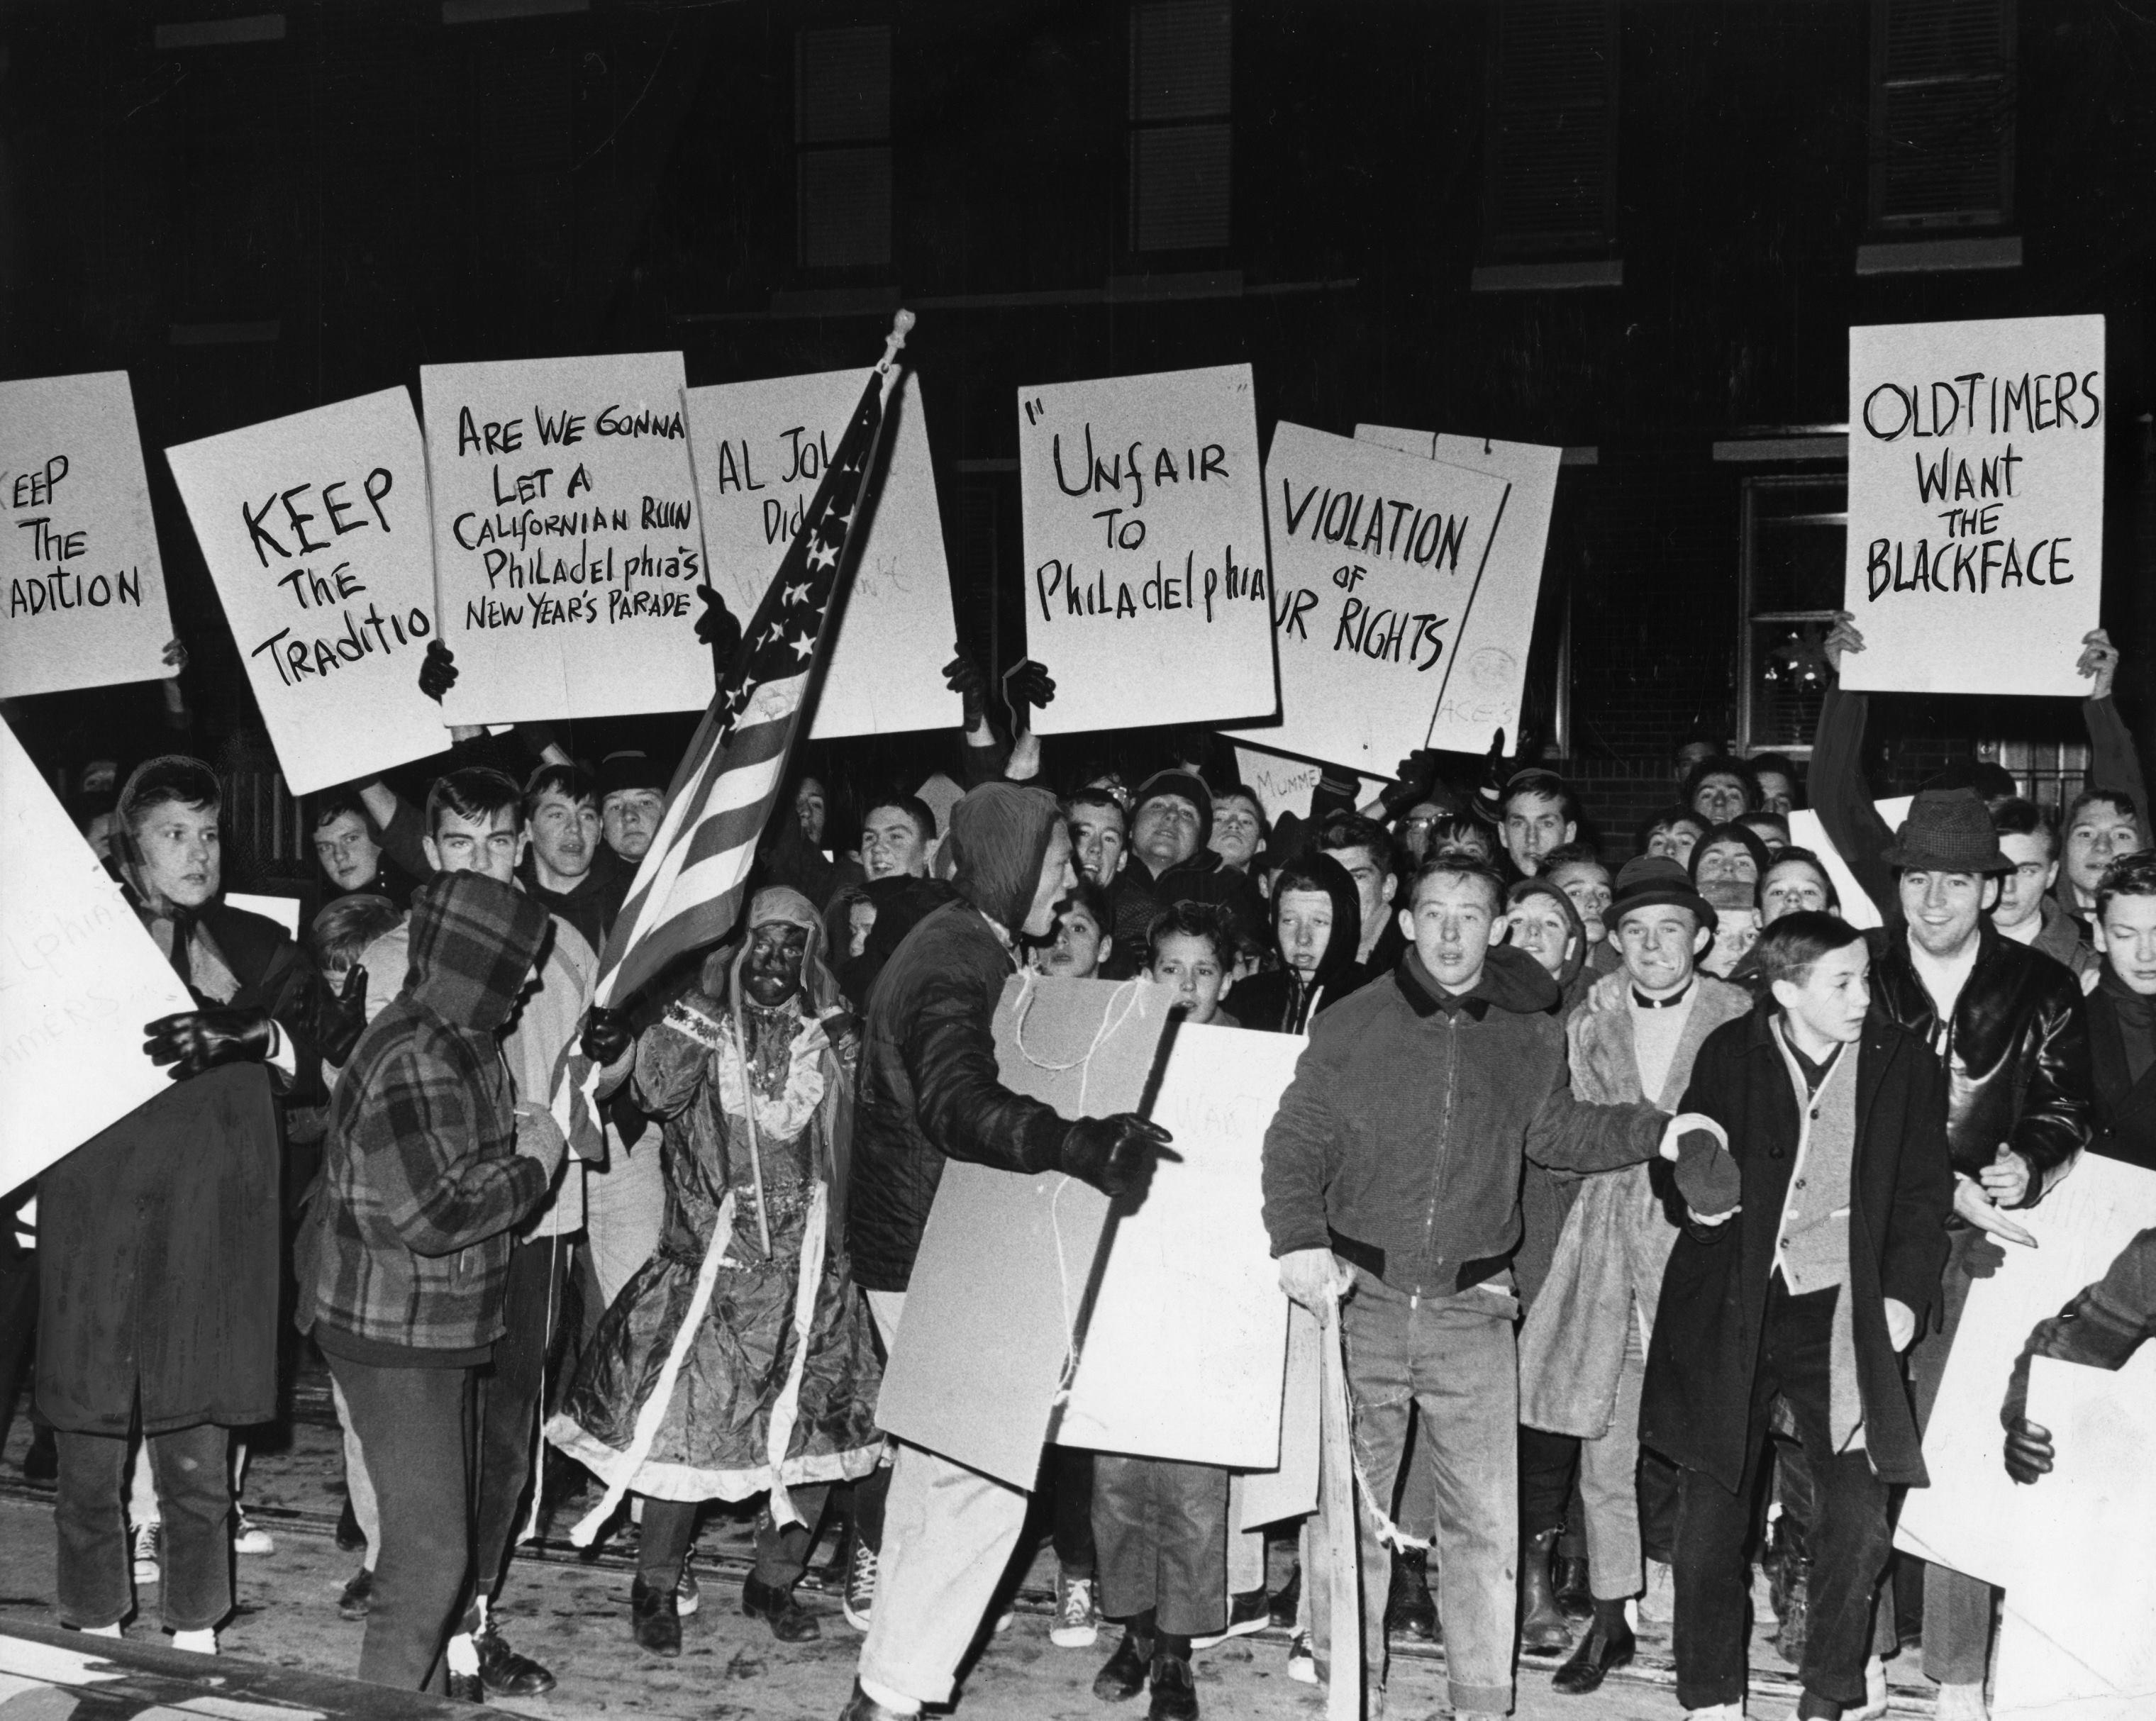 Demonstrators protest ban of blackface in Mummers parade, December 19, 1963